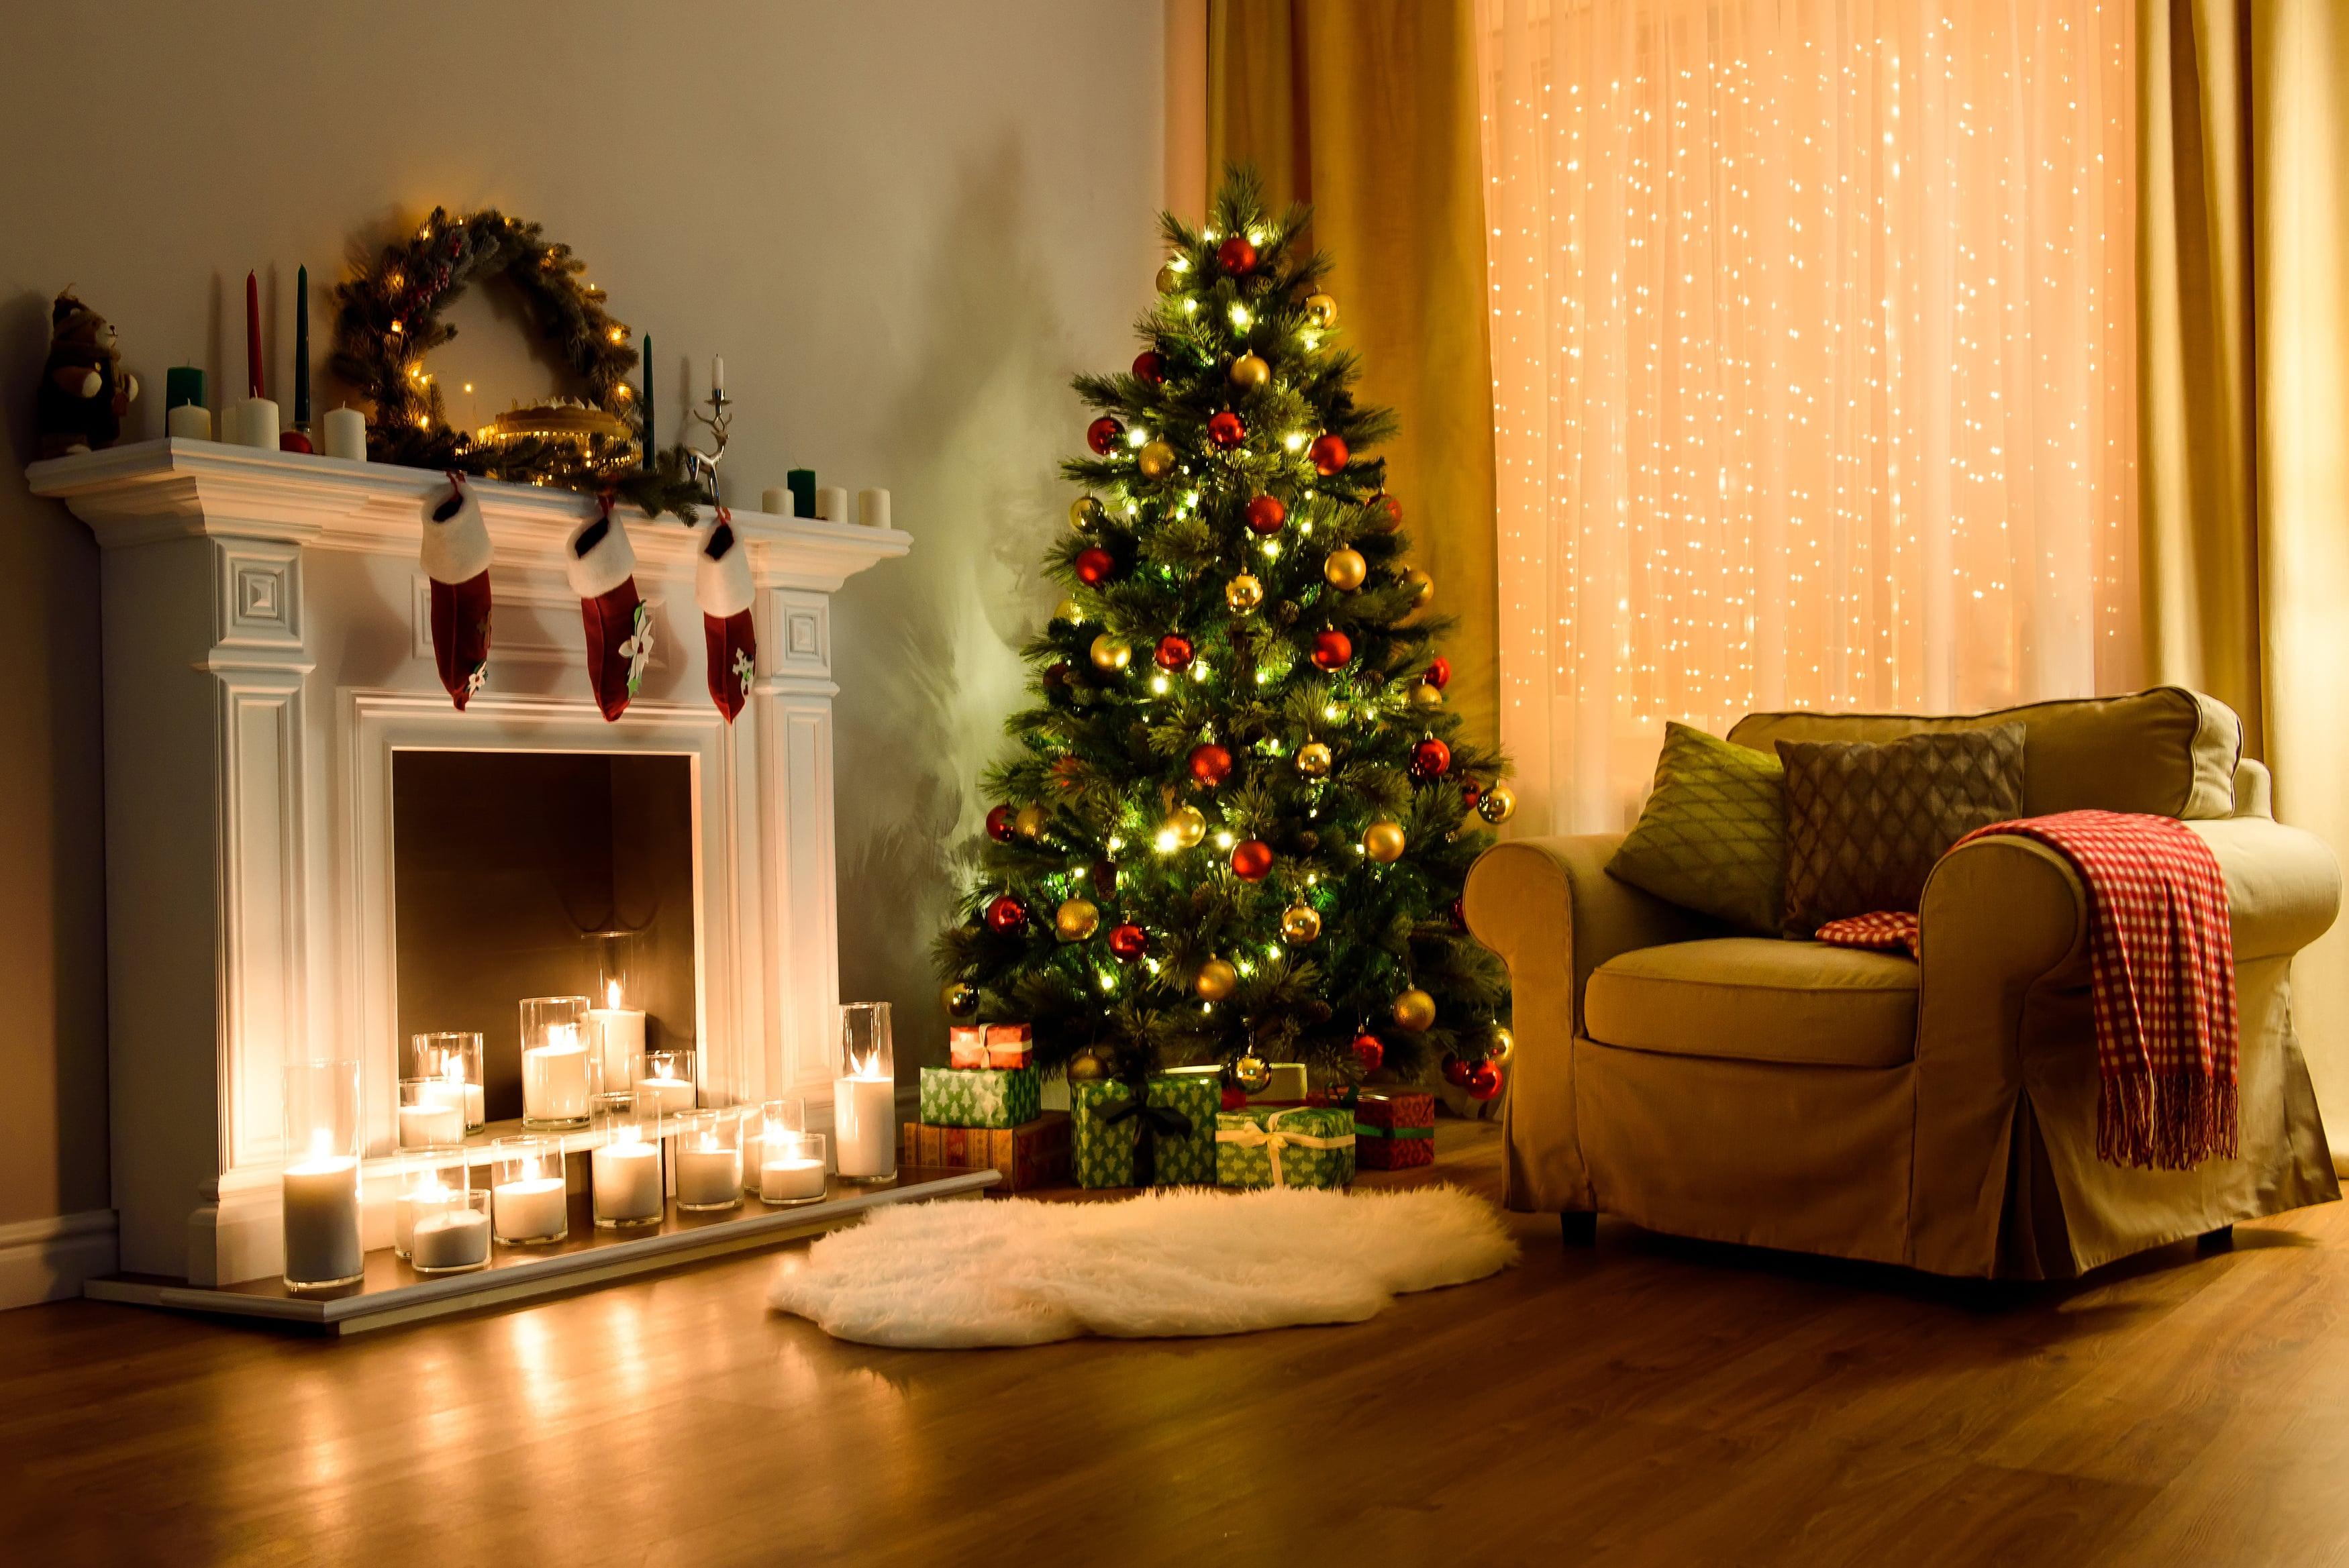 Christmas-room-interior-design